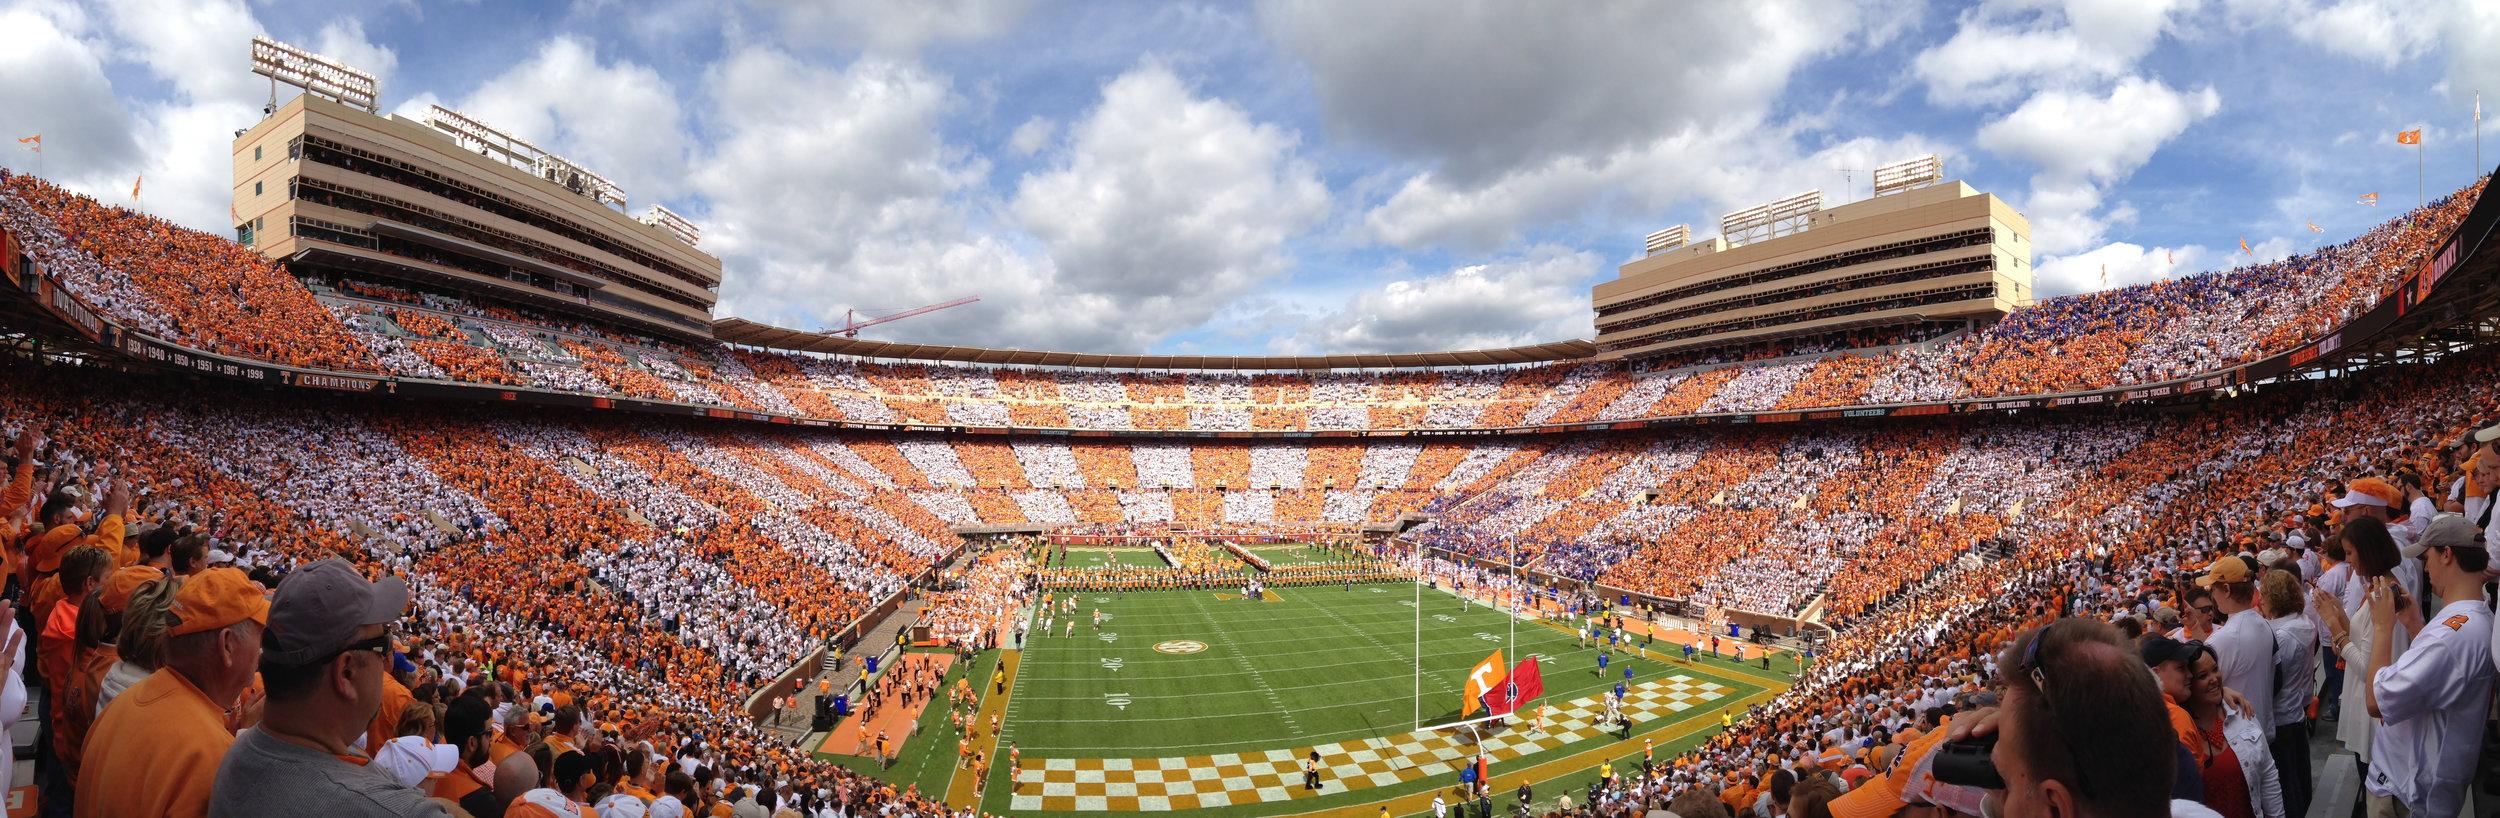 University+of+Tennessee+Stadium+Fish+Eye+Lense.jpg